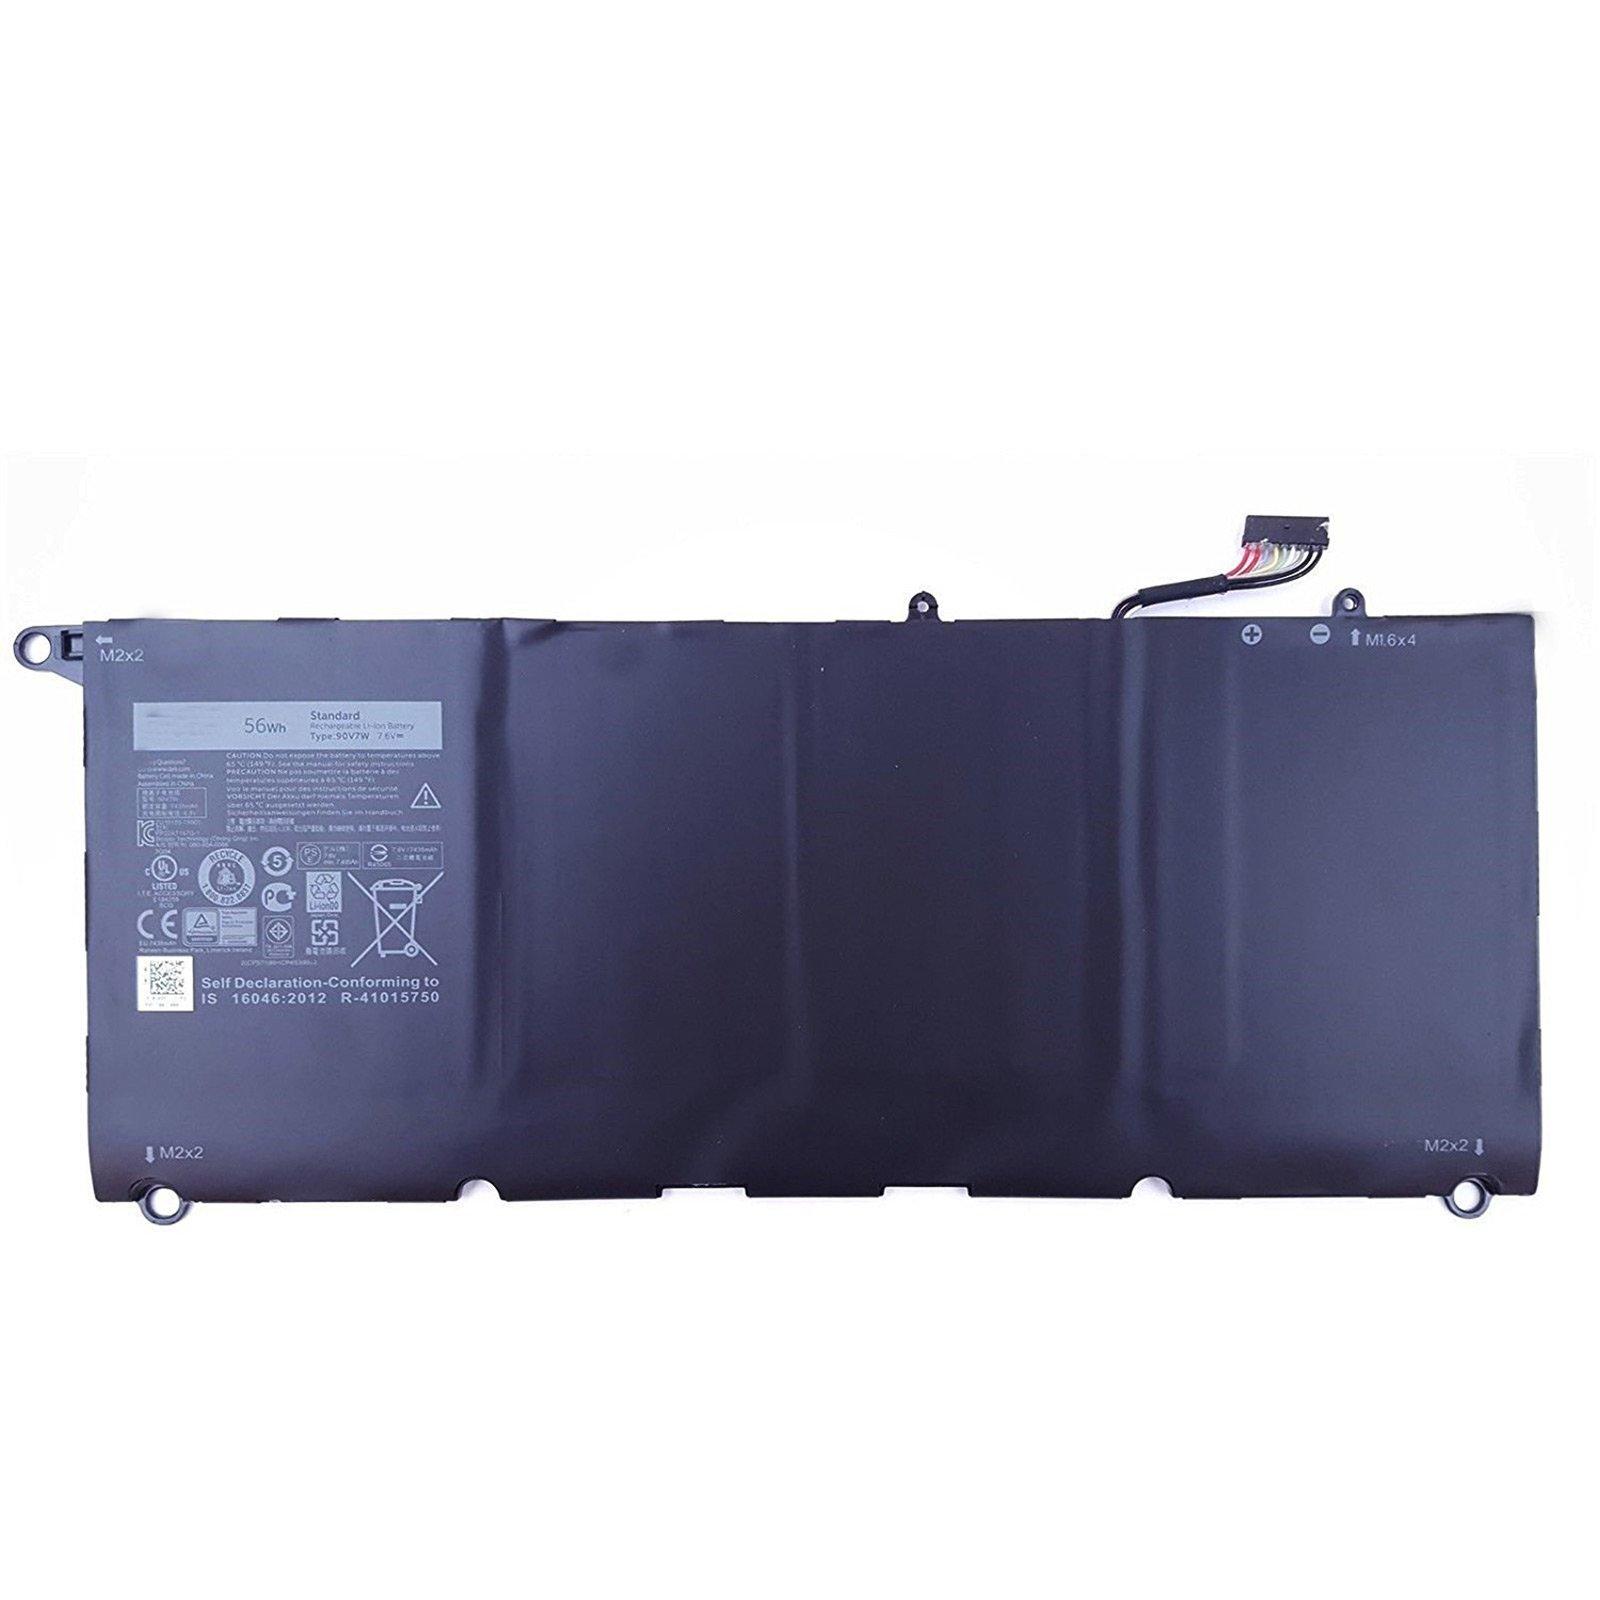 Bateria 90v7w 56wh 7.6v 6 Celdas Para Dell Xps 13 9350 Xps13-9350-d1608 Xps13-9350 5k9cp Din02 9ov7w